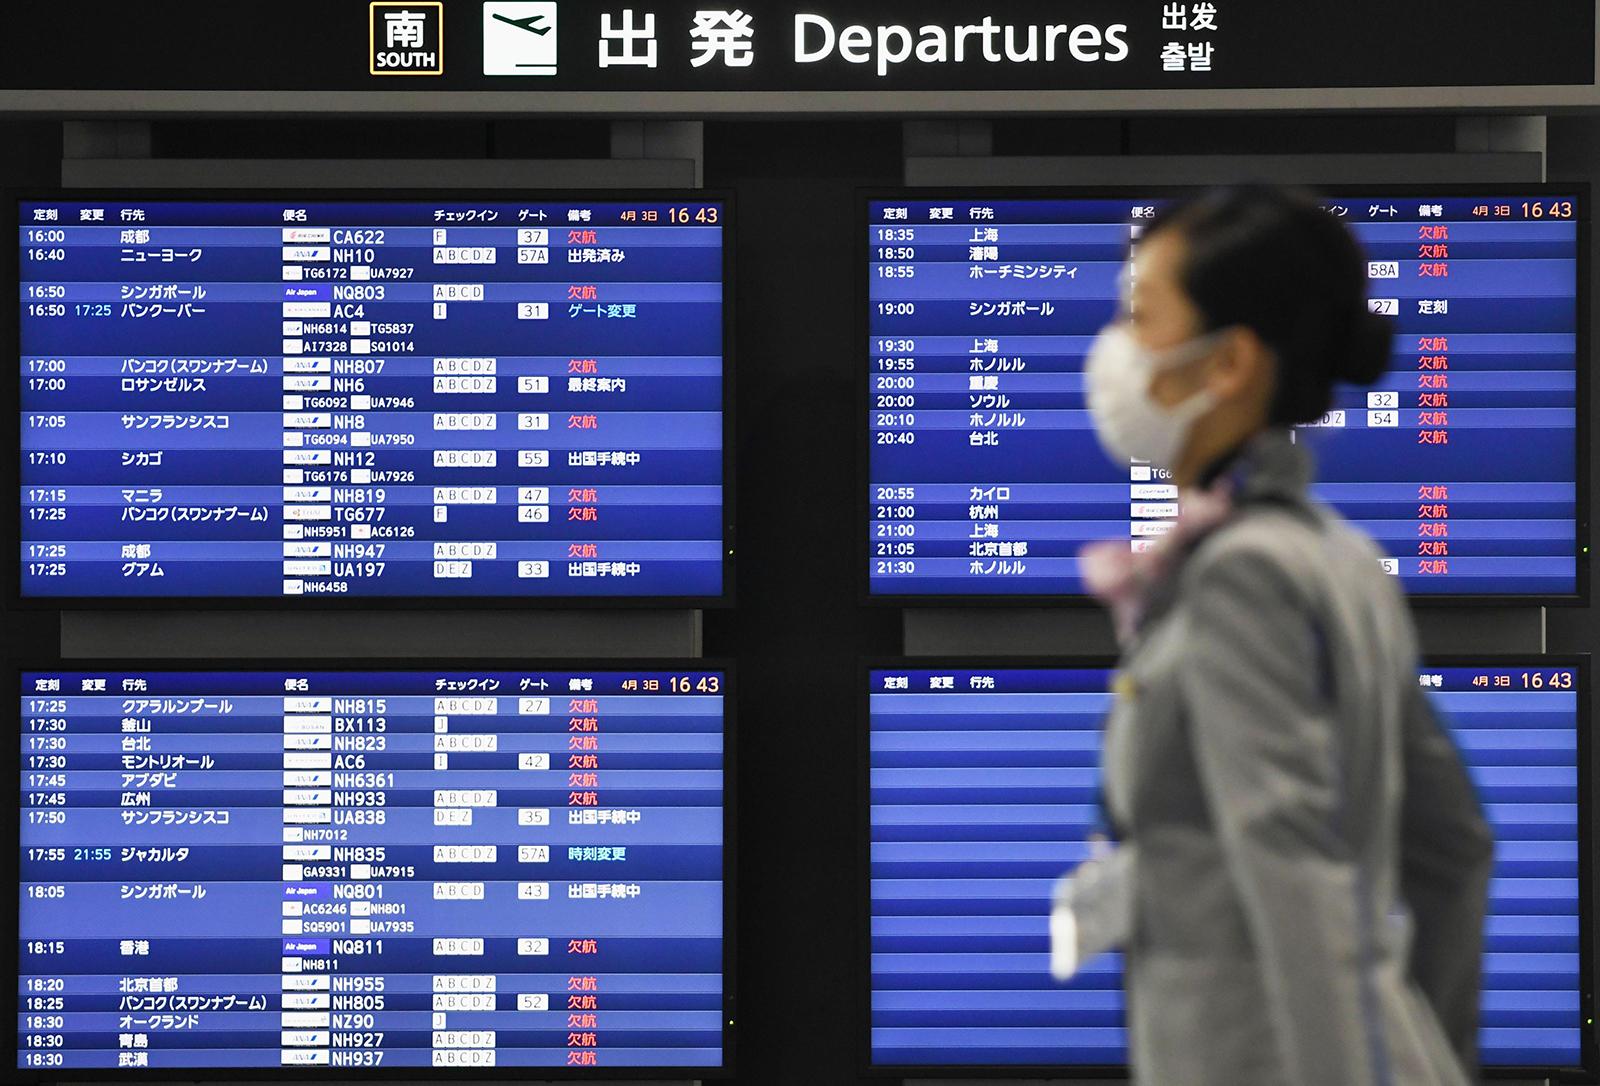 A woman walks past the departure board at Narita airport near Tokyo, on April 3.